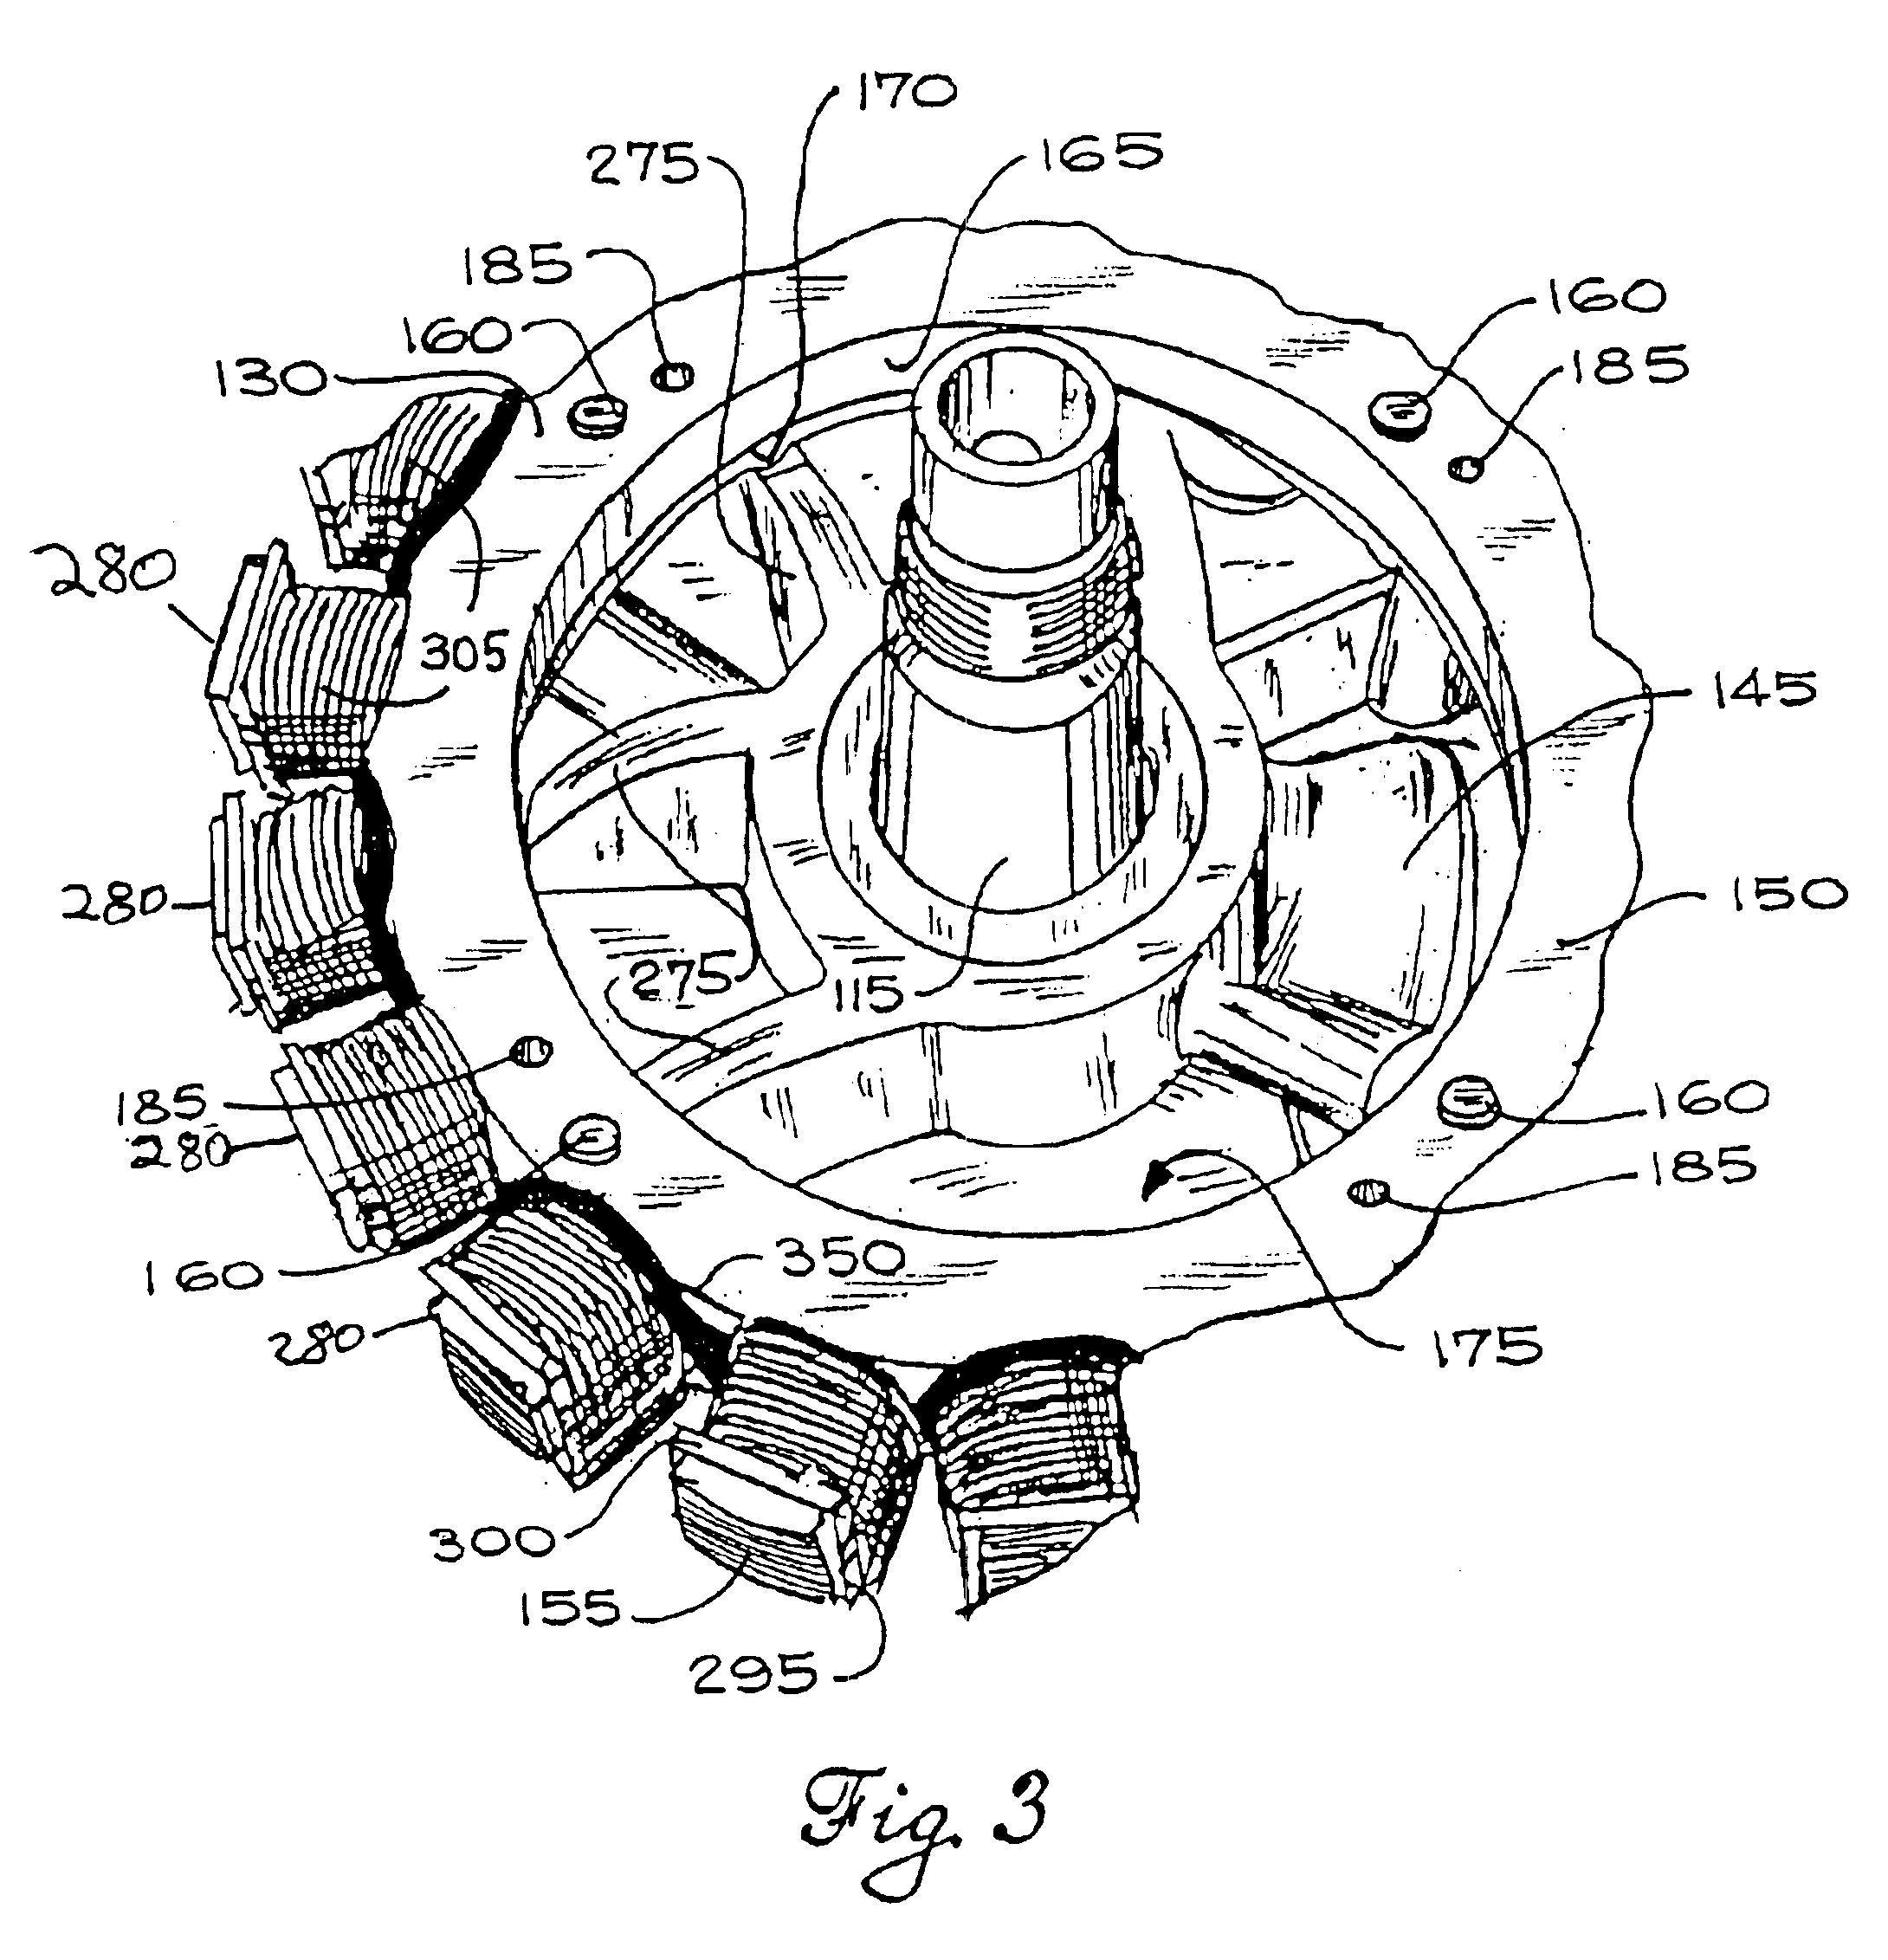 engine combustion phase diagram